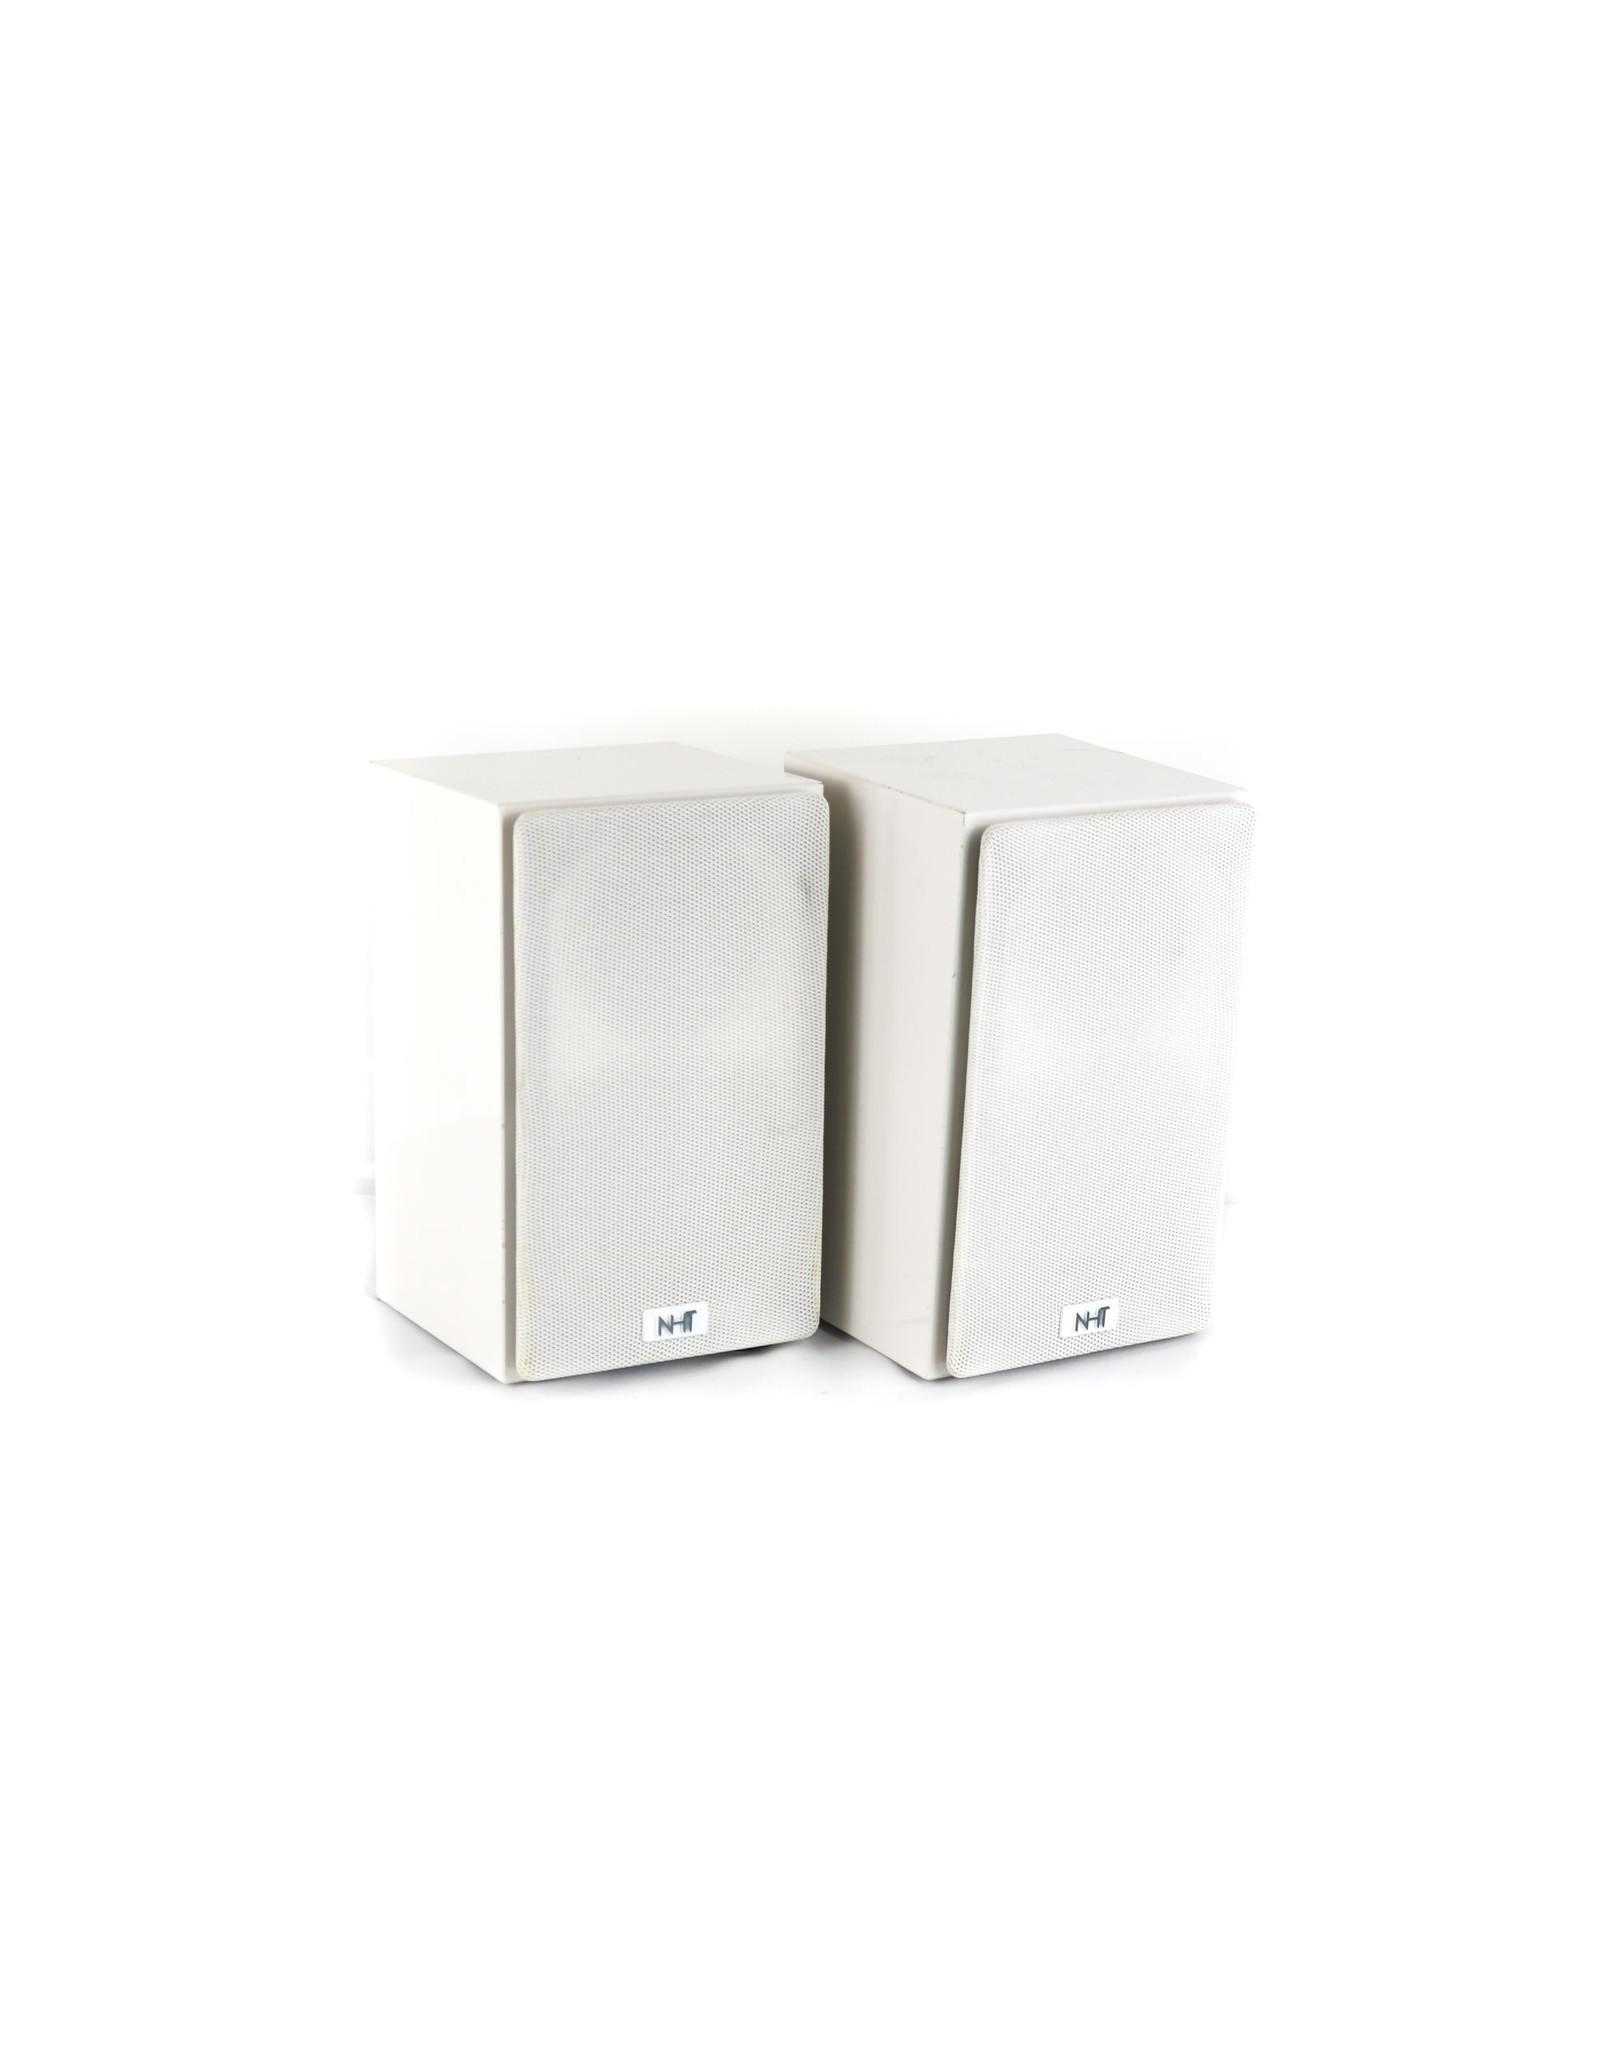 NHT NHT SuperZero Bookshelf Speakers White USED